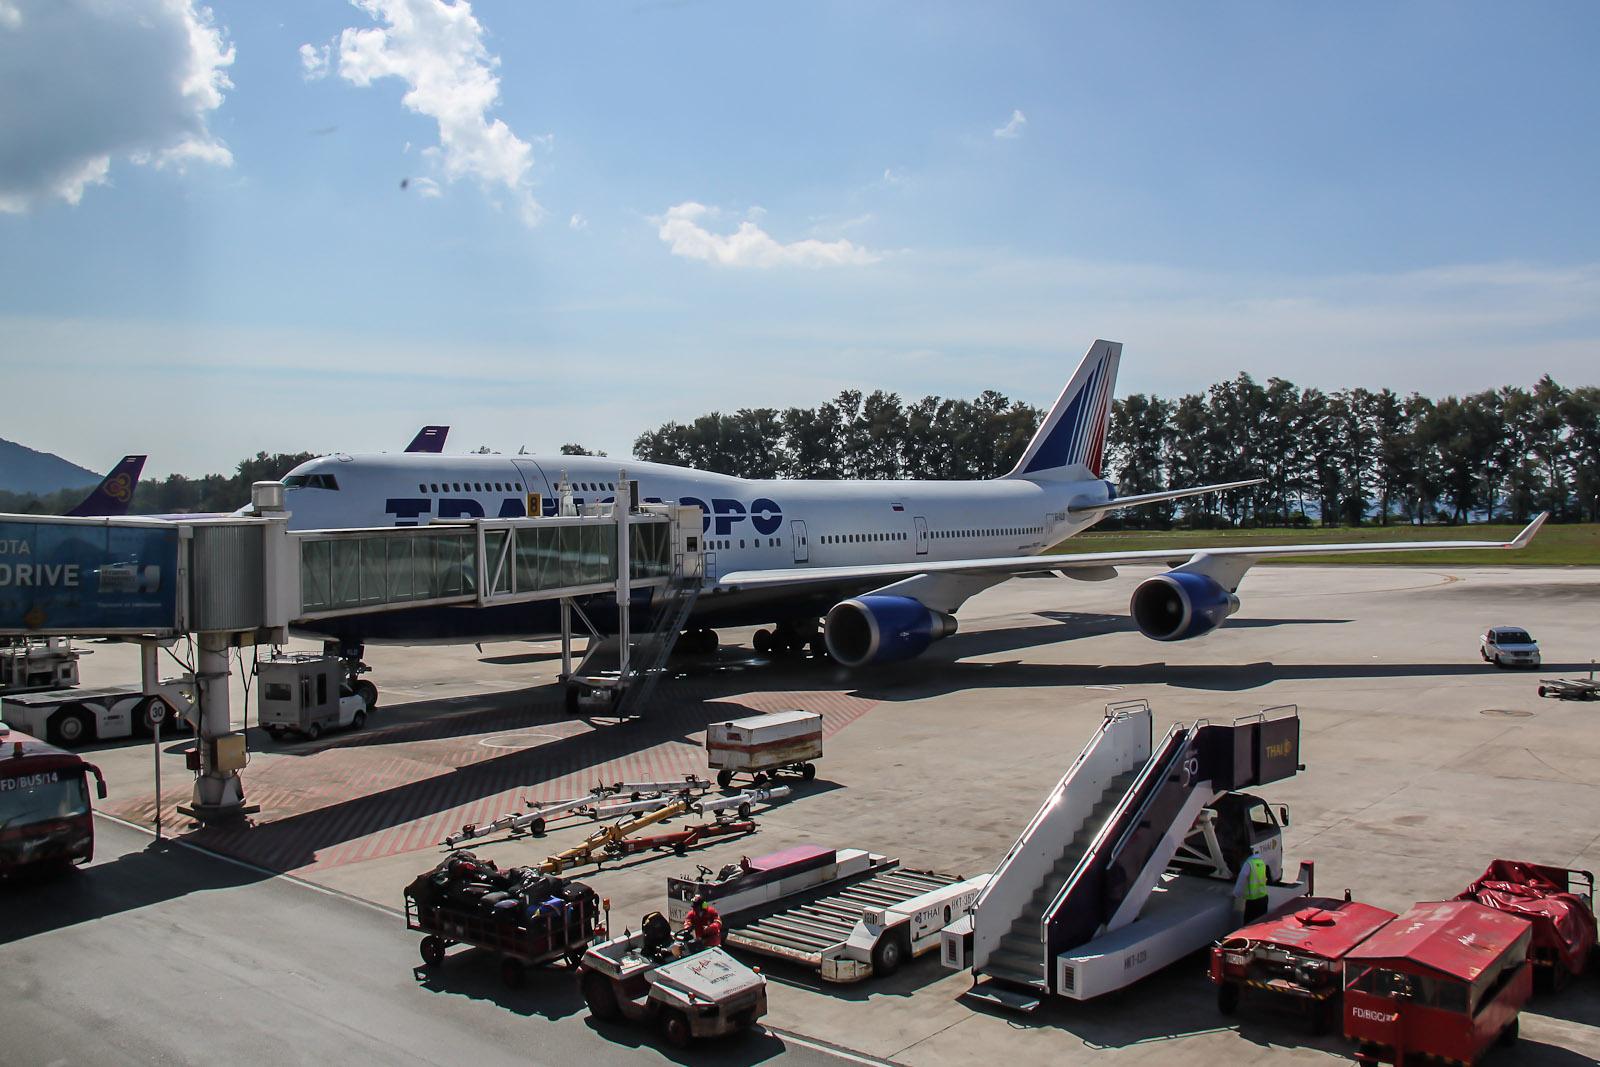 Боинг-747 Трансаэро в аэропорту Пхукета